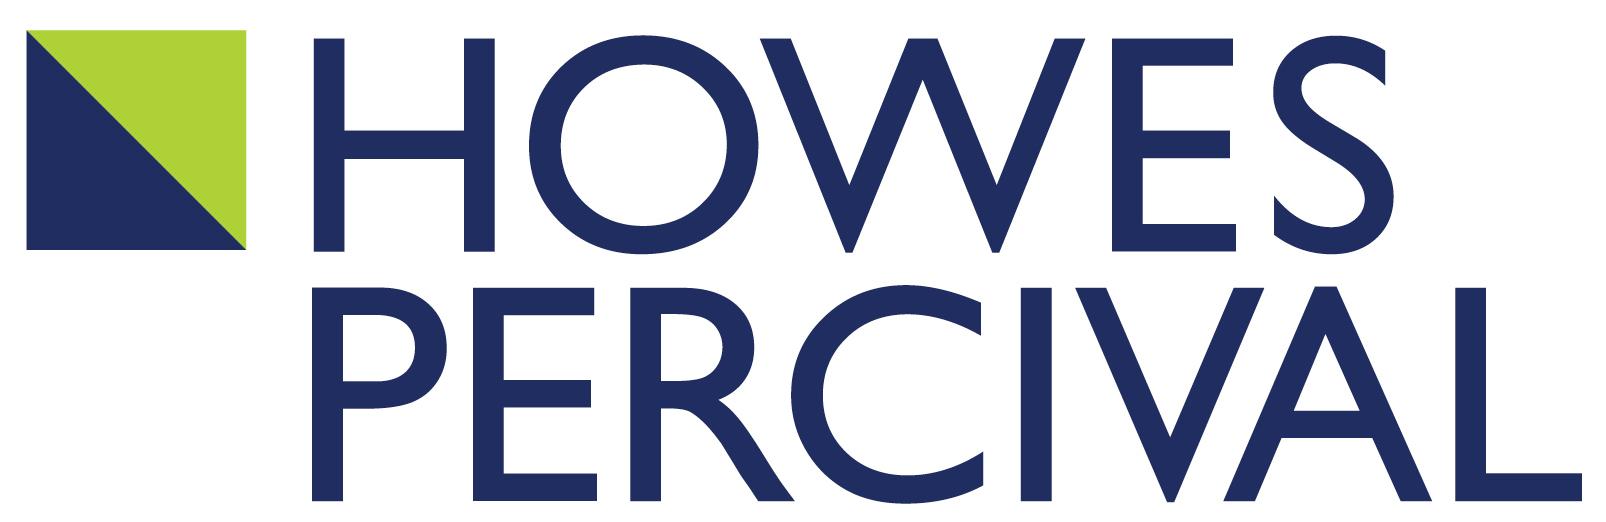 Current Howes Percival logo